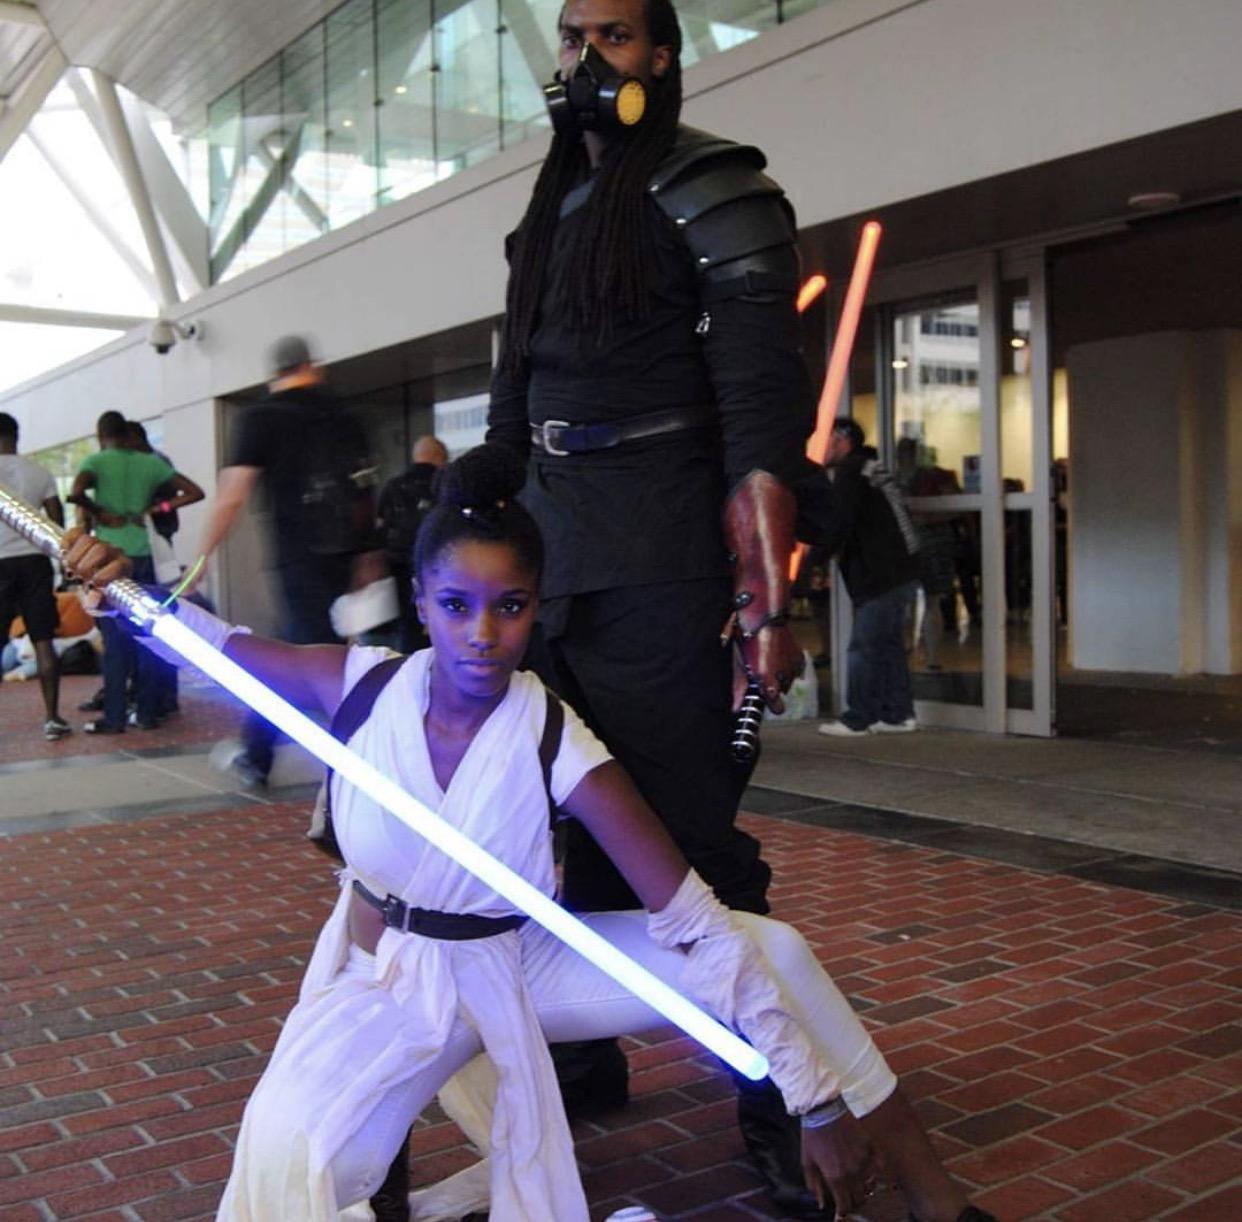 BCR - Star Wars Couple